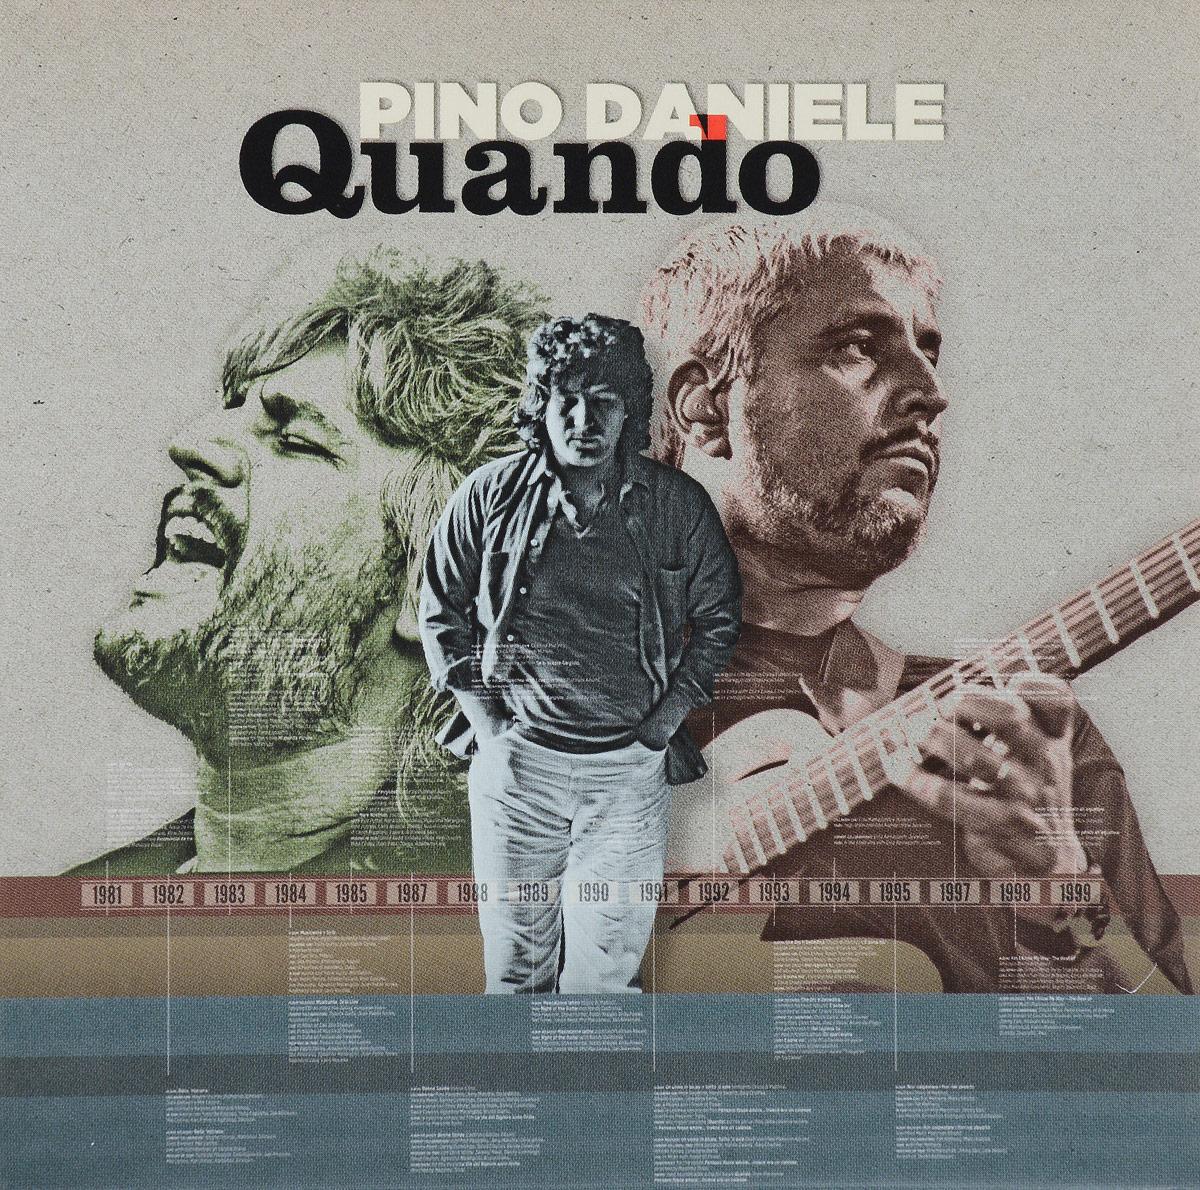 Пино Даниэль Pino Daniele. Quando (3 CD) жак пино китайский кулак